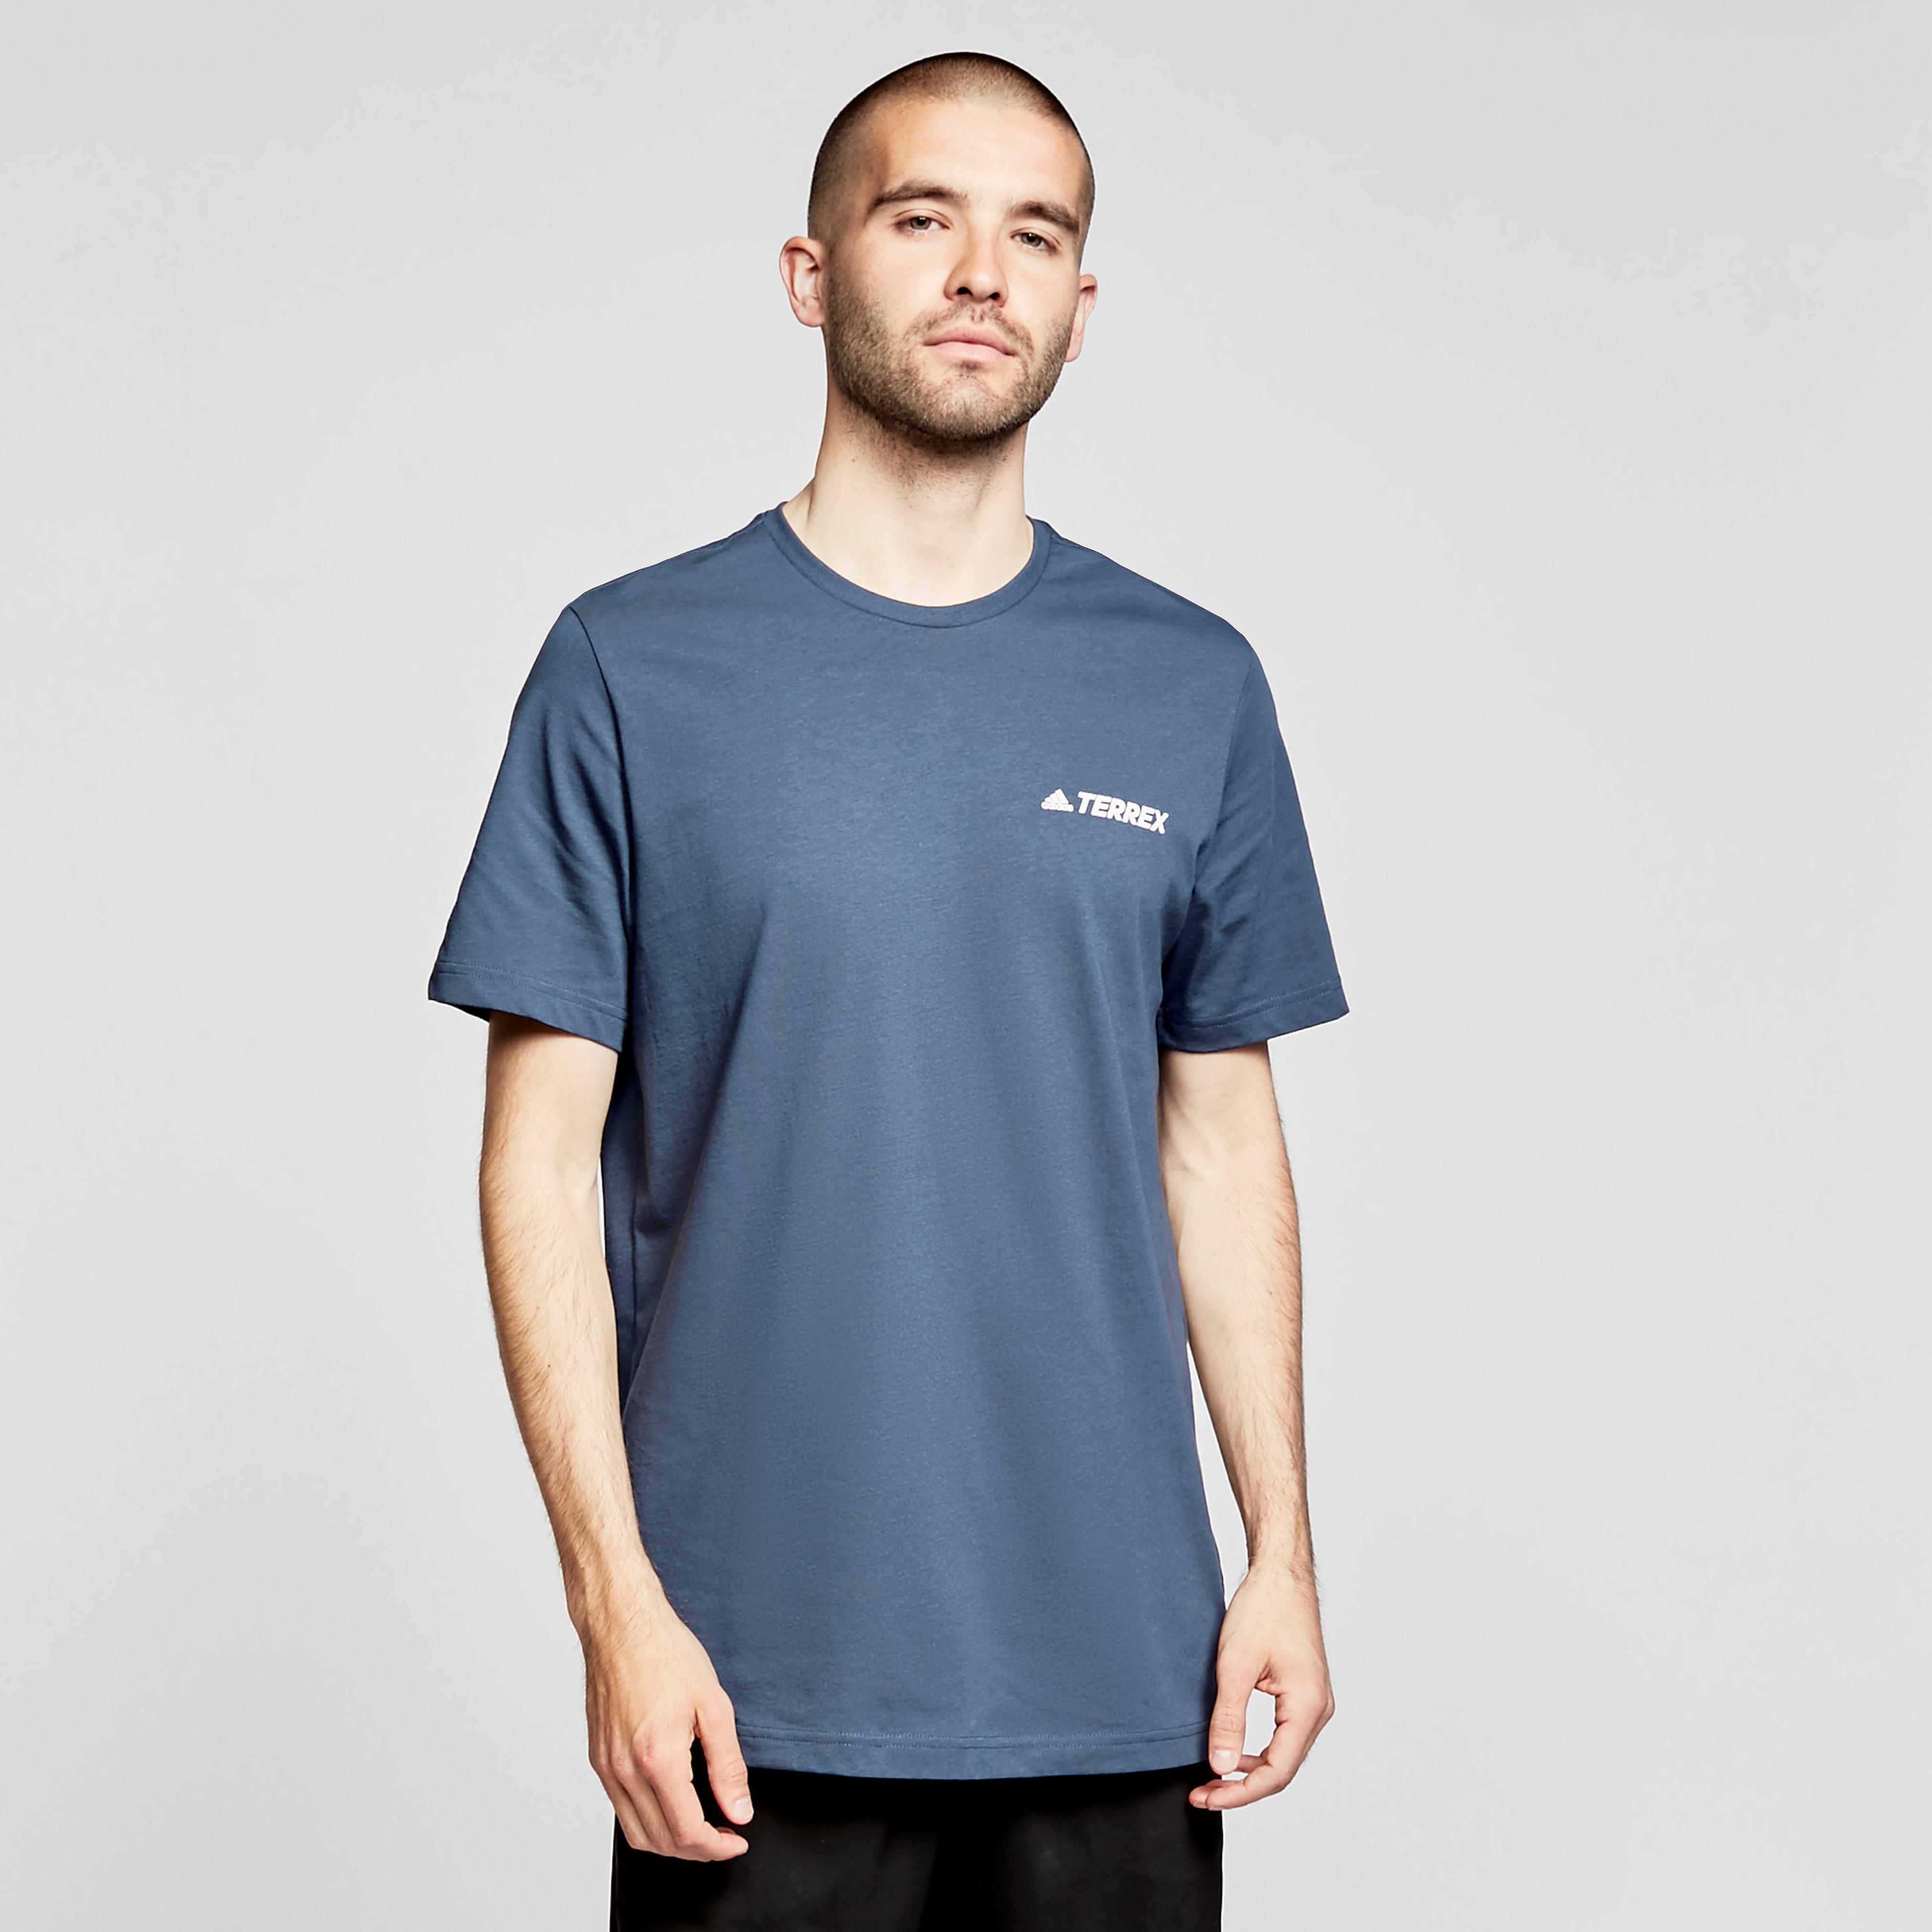 Image of Adidas Men's Rocklogo Short-Sleeve Tee - Navy/Navy, NAVY/NAVY